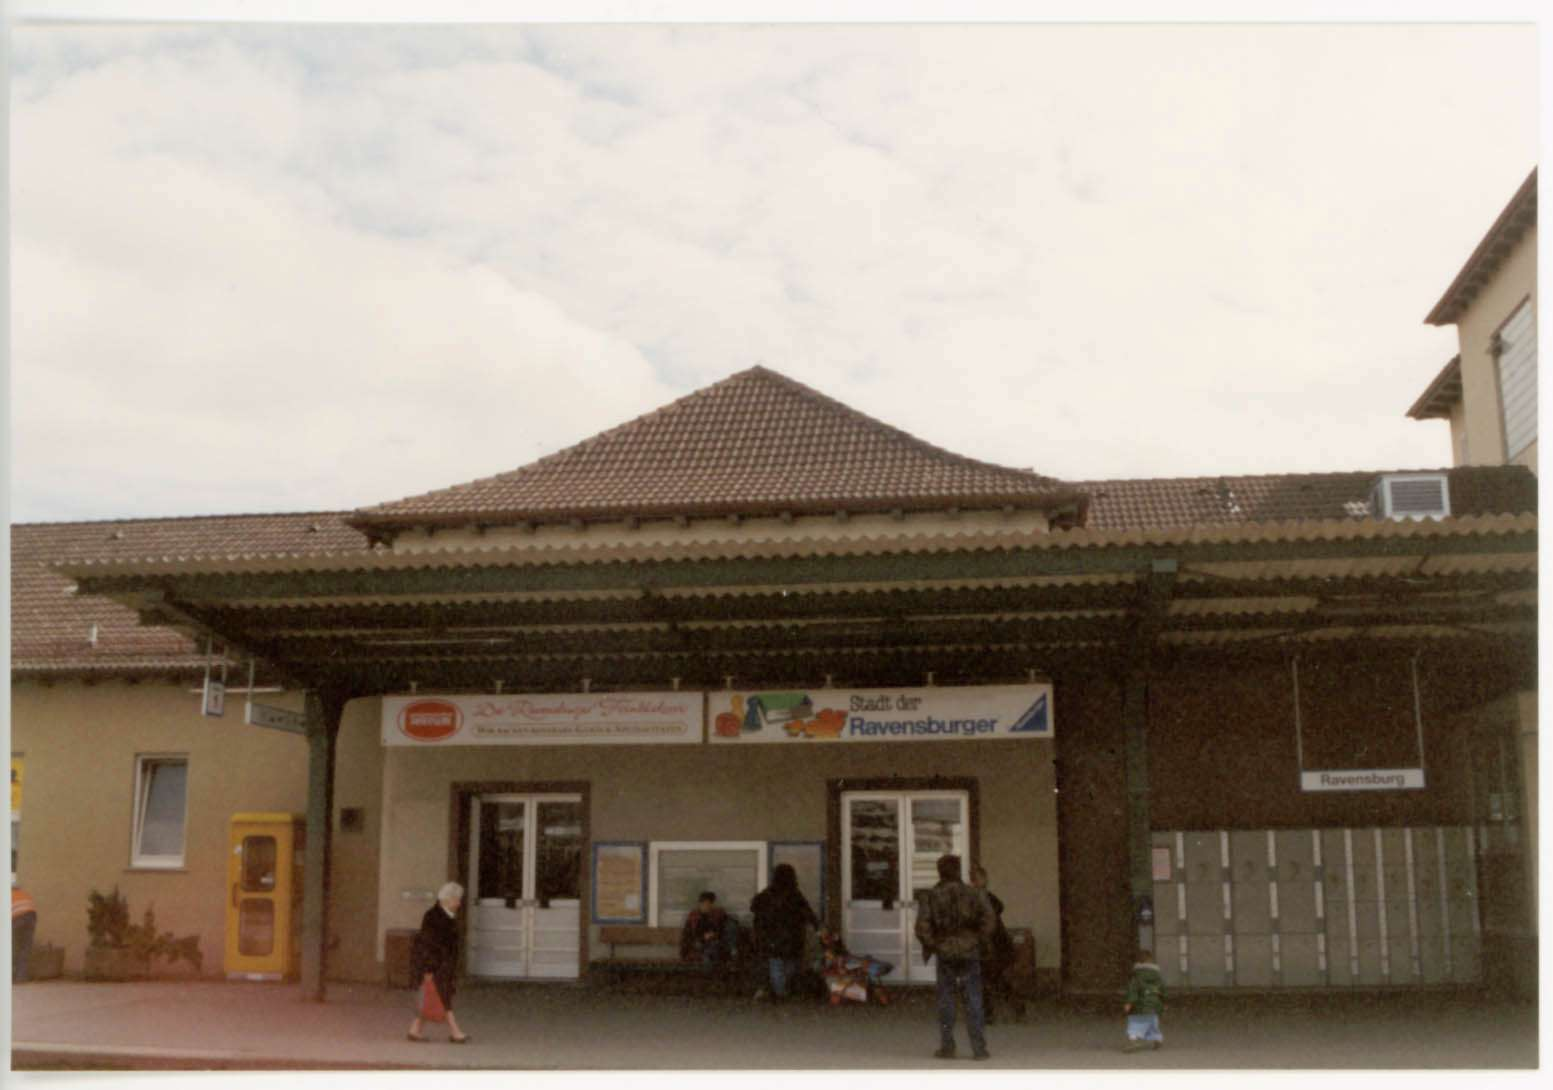 Ravensburg: 15 Fotos, Bild 2